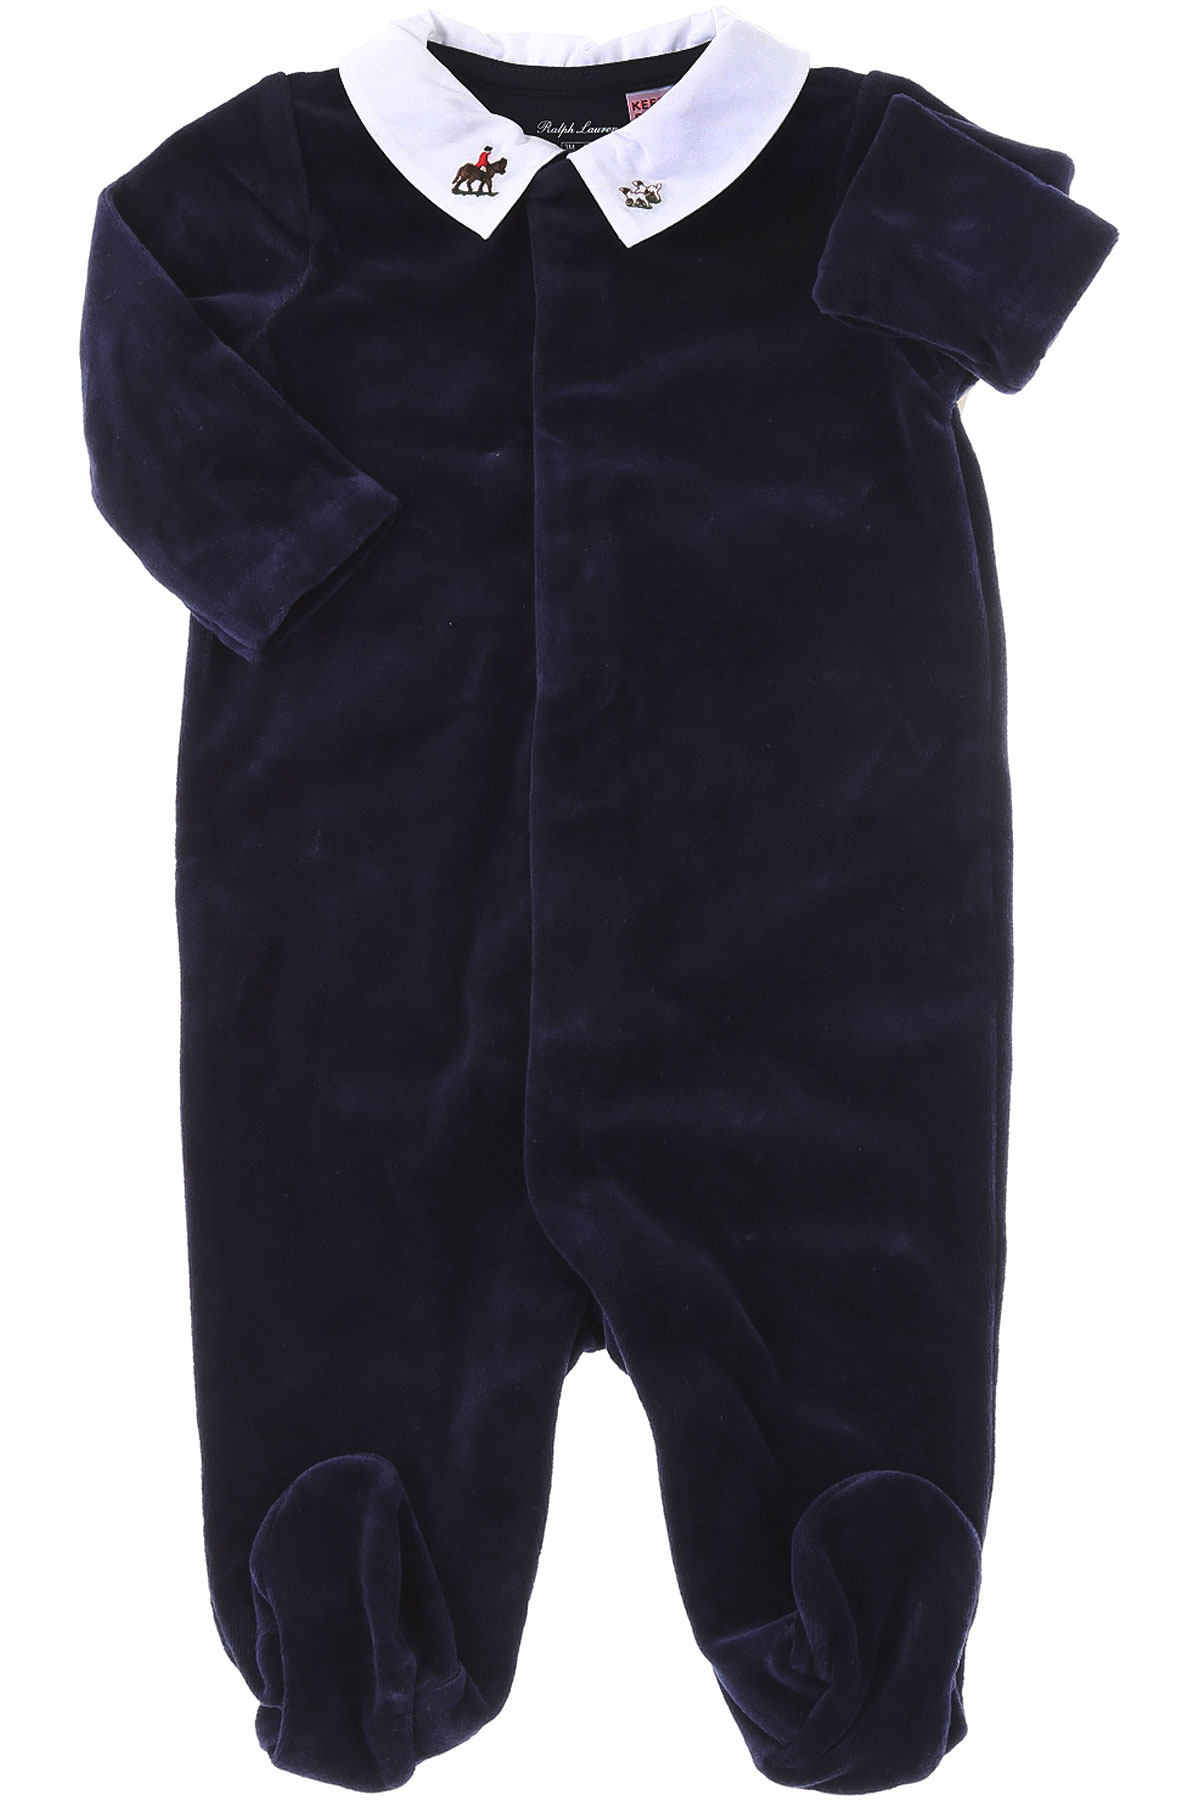 Ralph Lauren Baby Bodysuits & Onesies for Boys On Sale, navy, Cotton, 2019, 3M 6M 9M